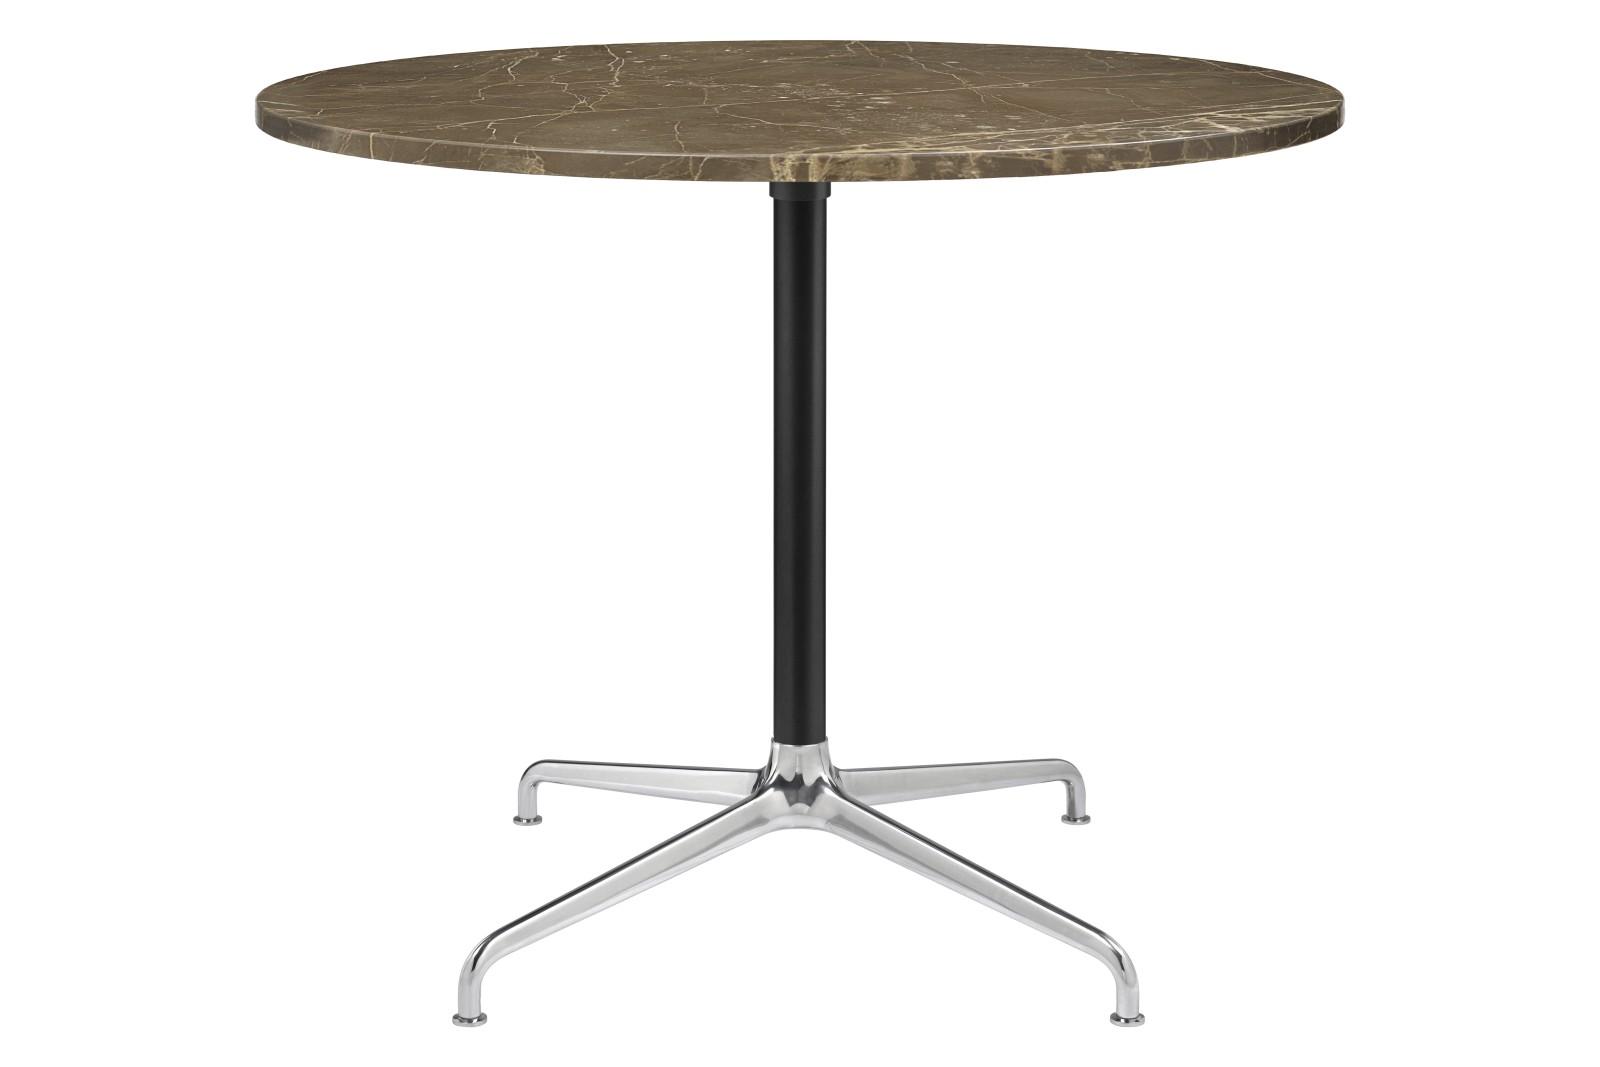 Beetle 4-Star Base Round Dining Table, Large Gubi Metal Polished Aluminium / Black Matt, Brown Emper